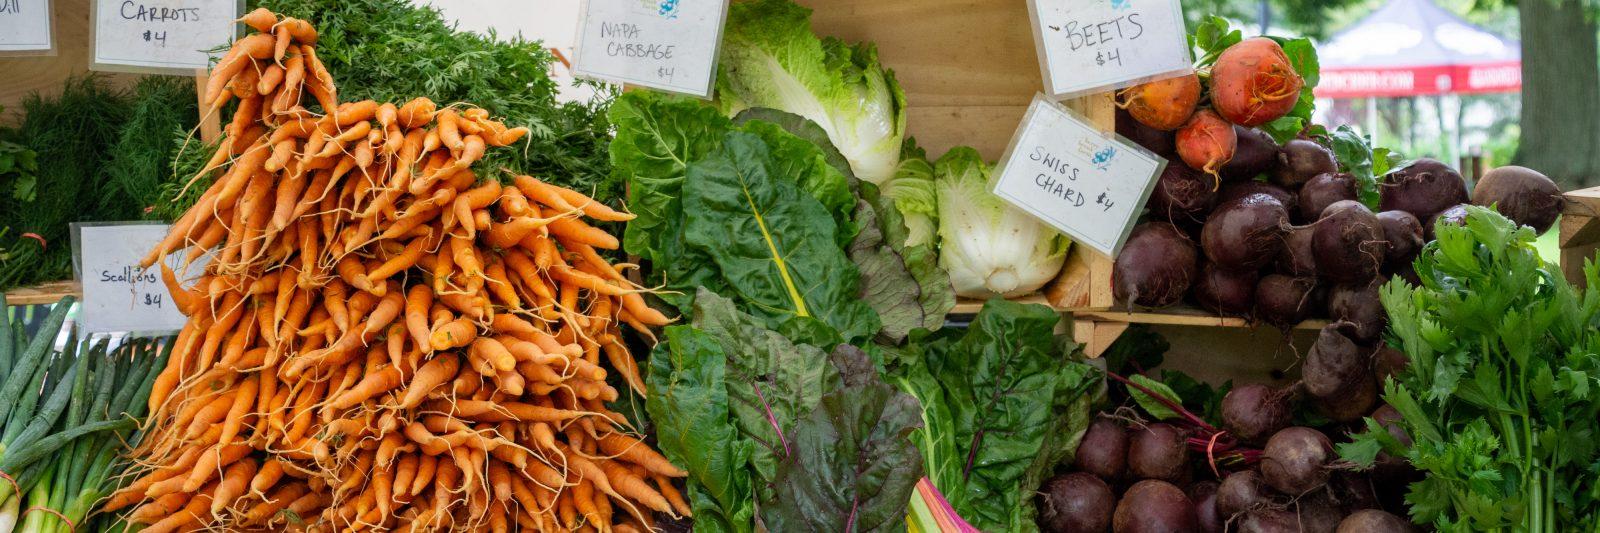 Fresh produce from Berry Brook Farm at Tarrytown and Sleepy Hollow Farmers Market.